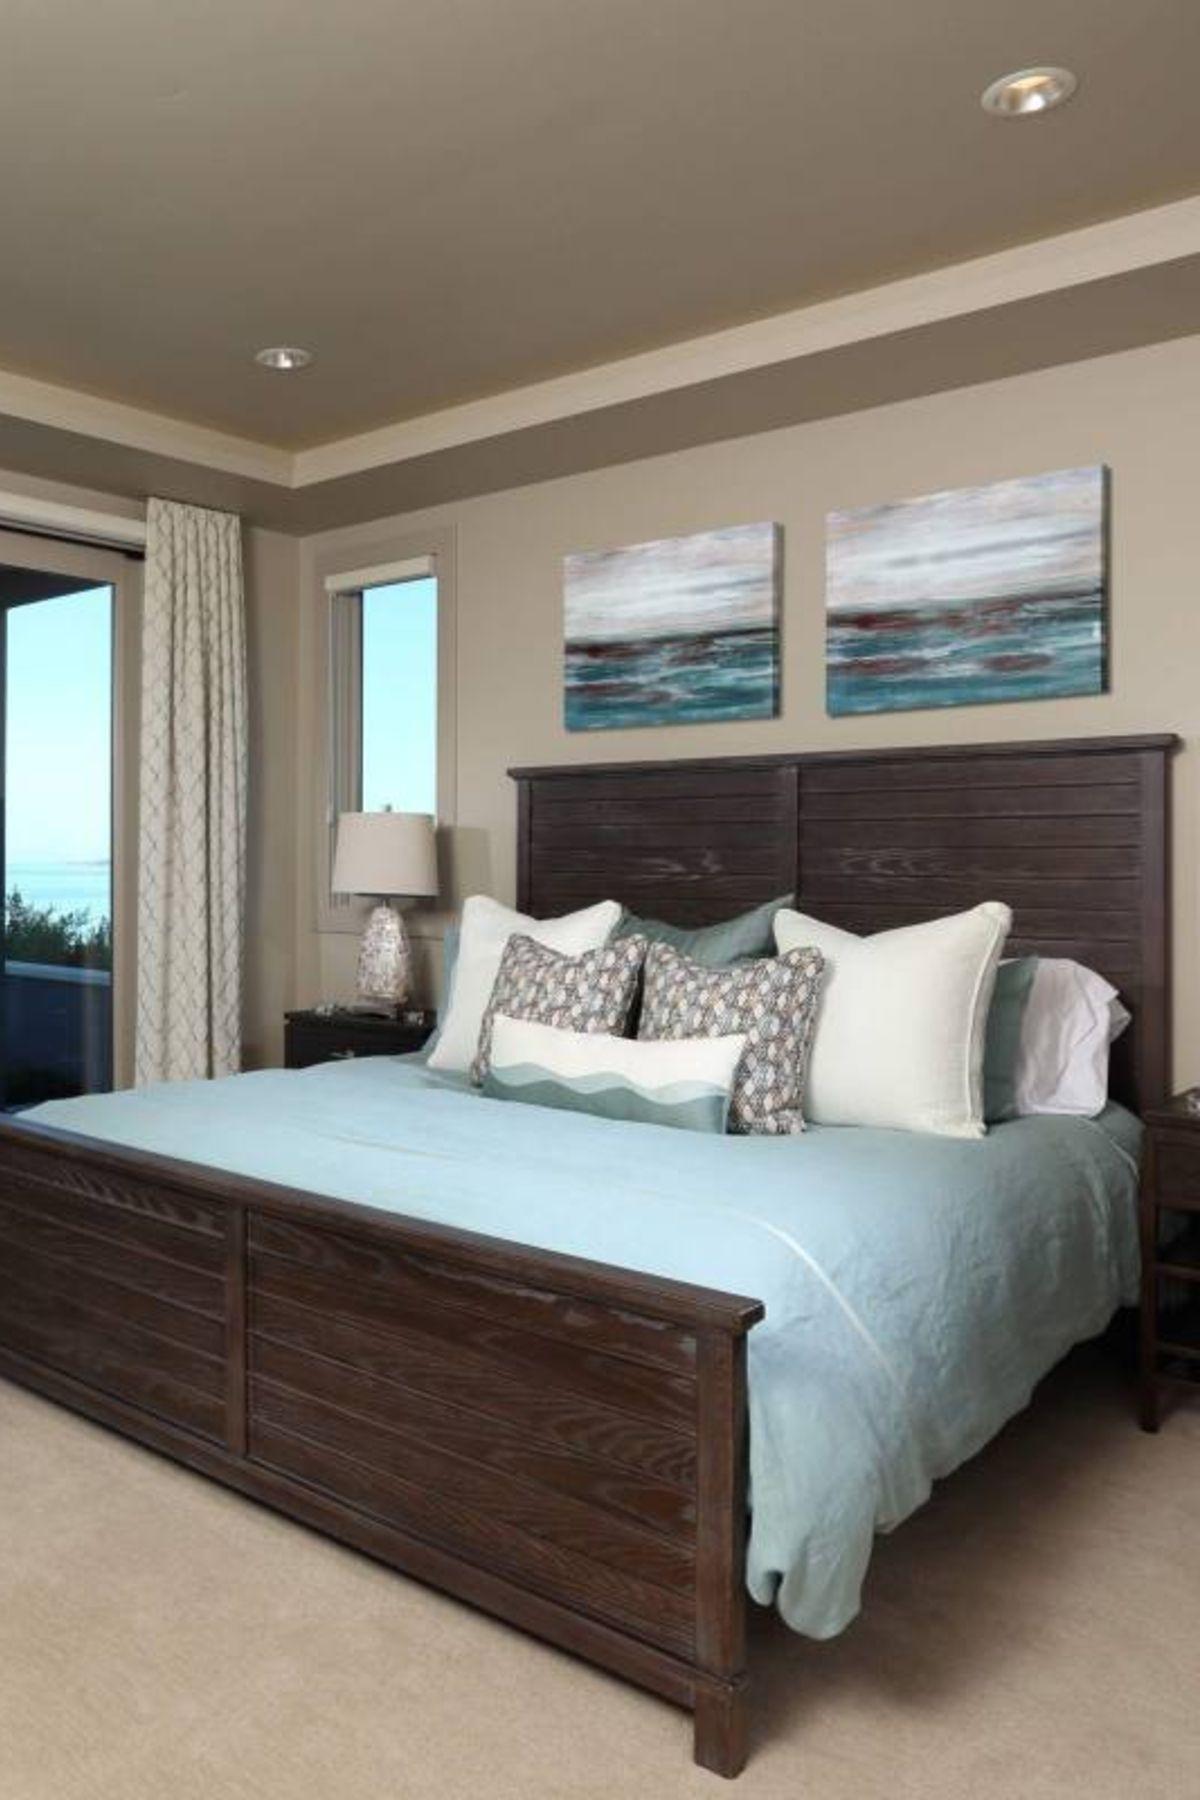 39 Guest Bedroom Decor Ideas Dark Furniture Simple Blue Bedding Bedroom Decor Dark Bedroom Decor On A Budget Small Guest Bedroom